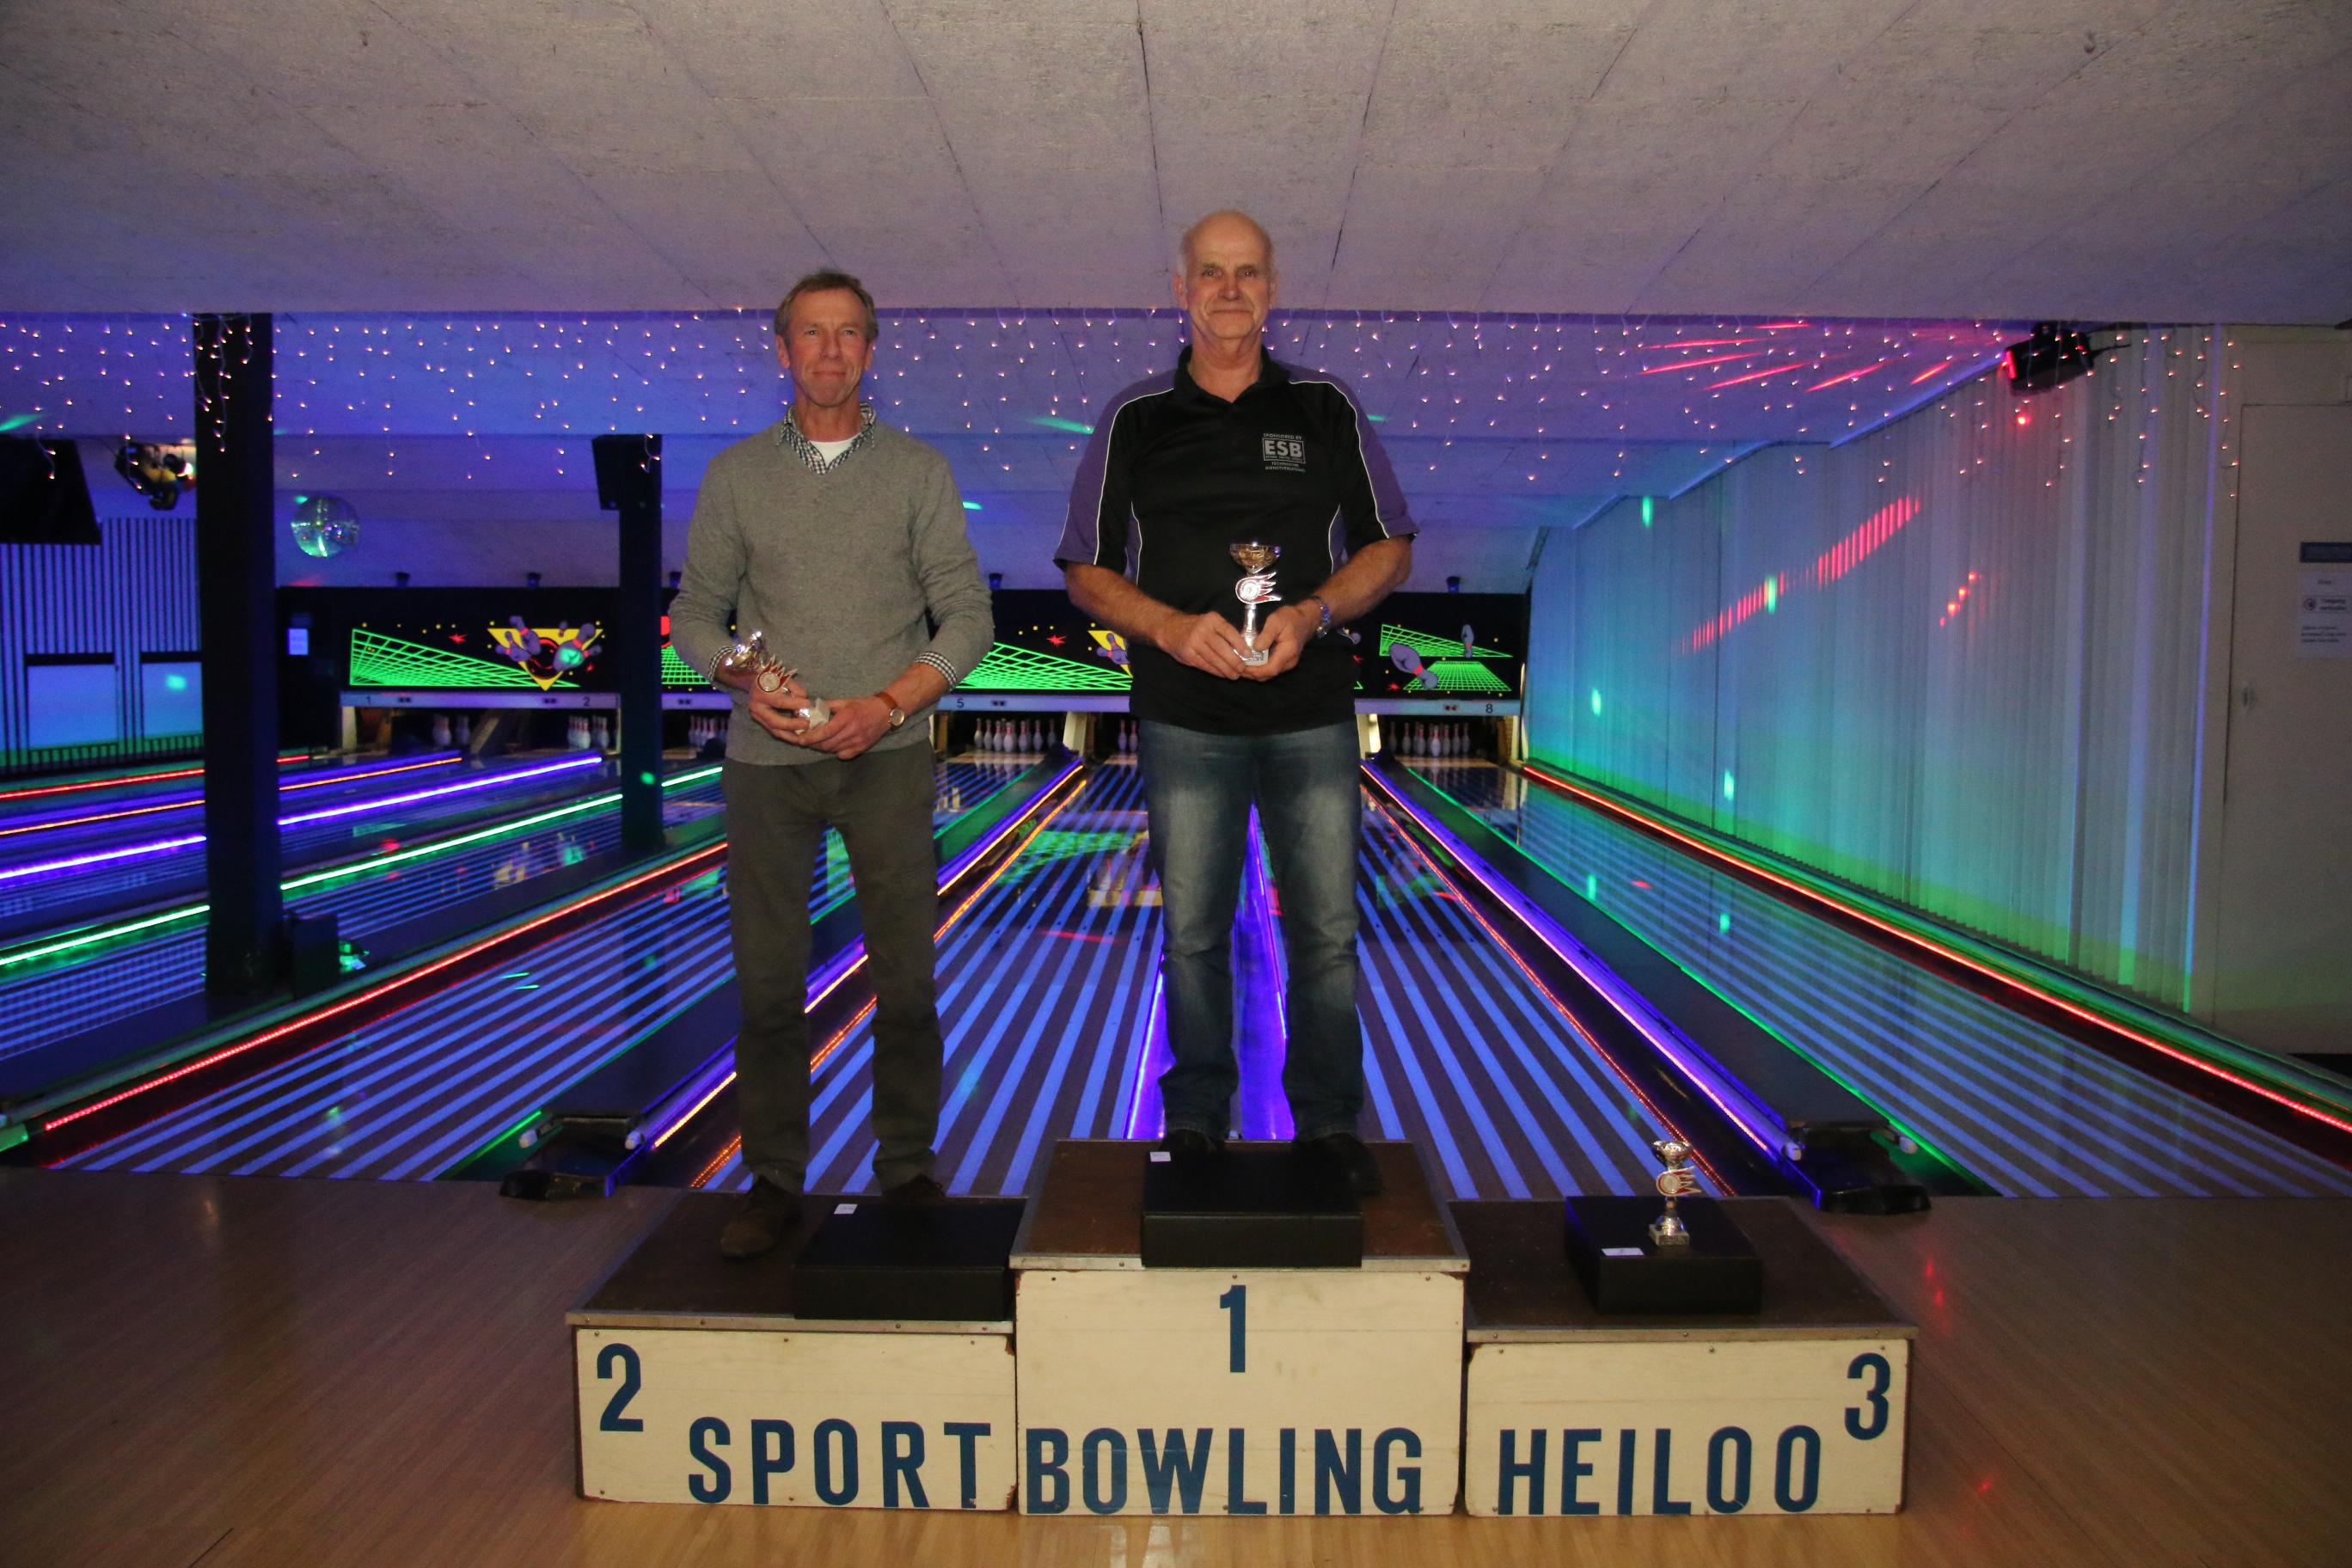 http://www.bowlingverenigingheiloo.nl/fotos_verhalen/foto's/2016_1222-Kerst-Heren-B.jpg